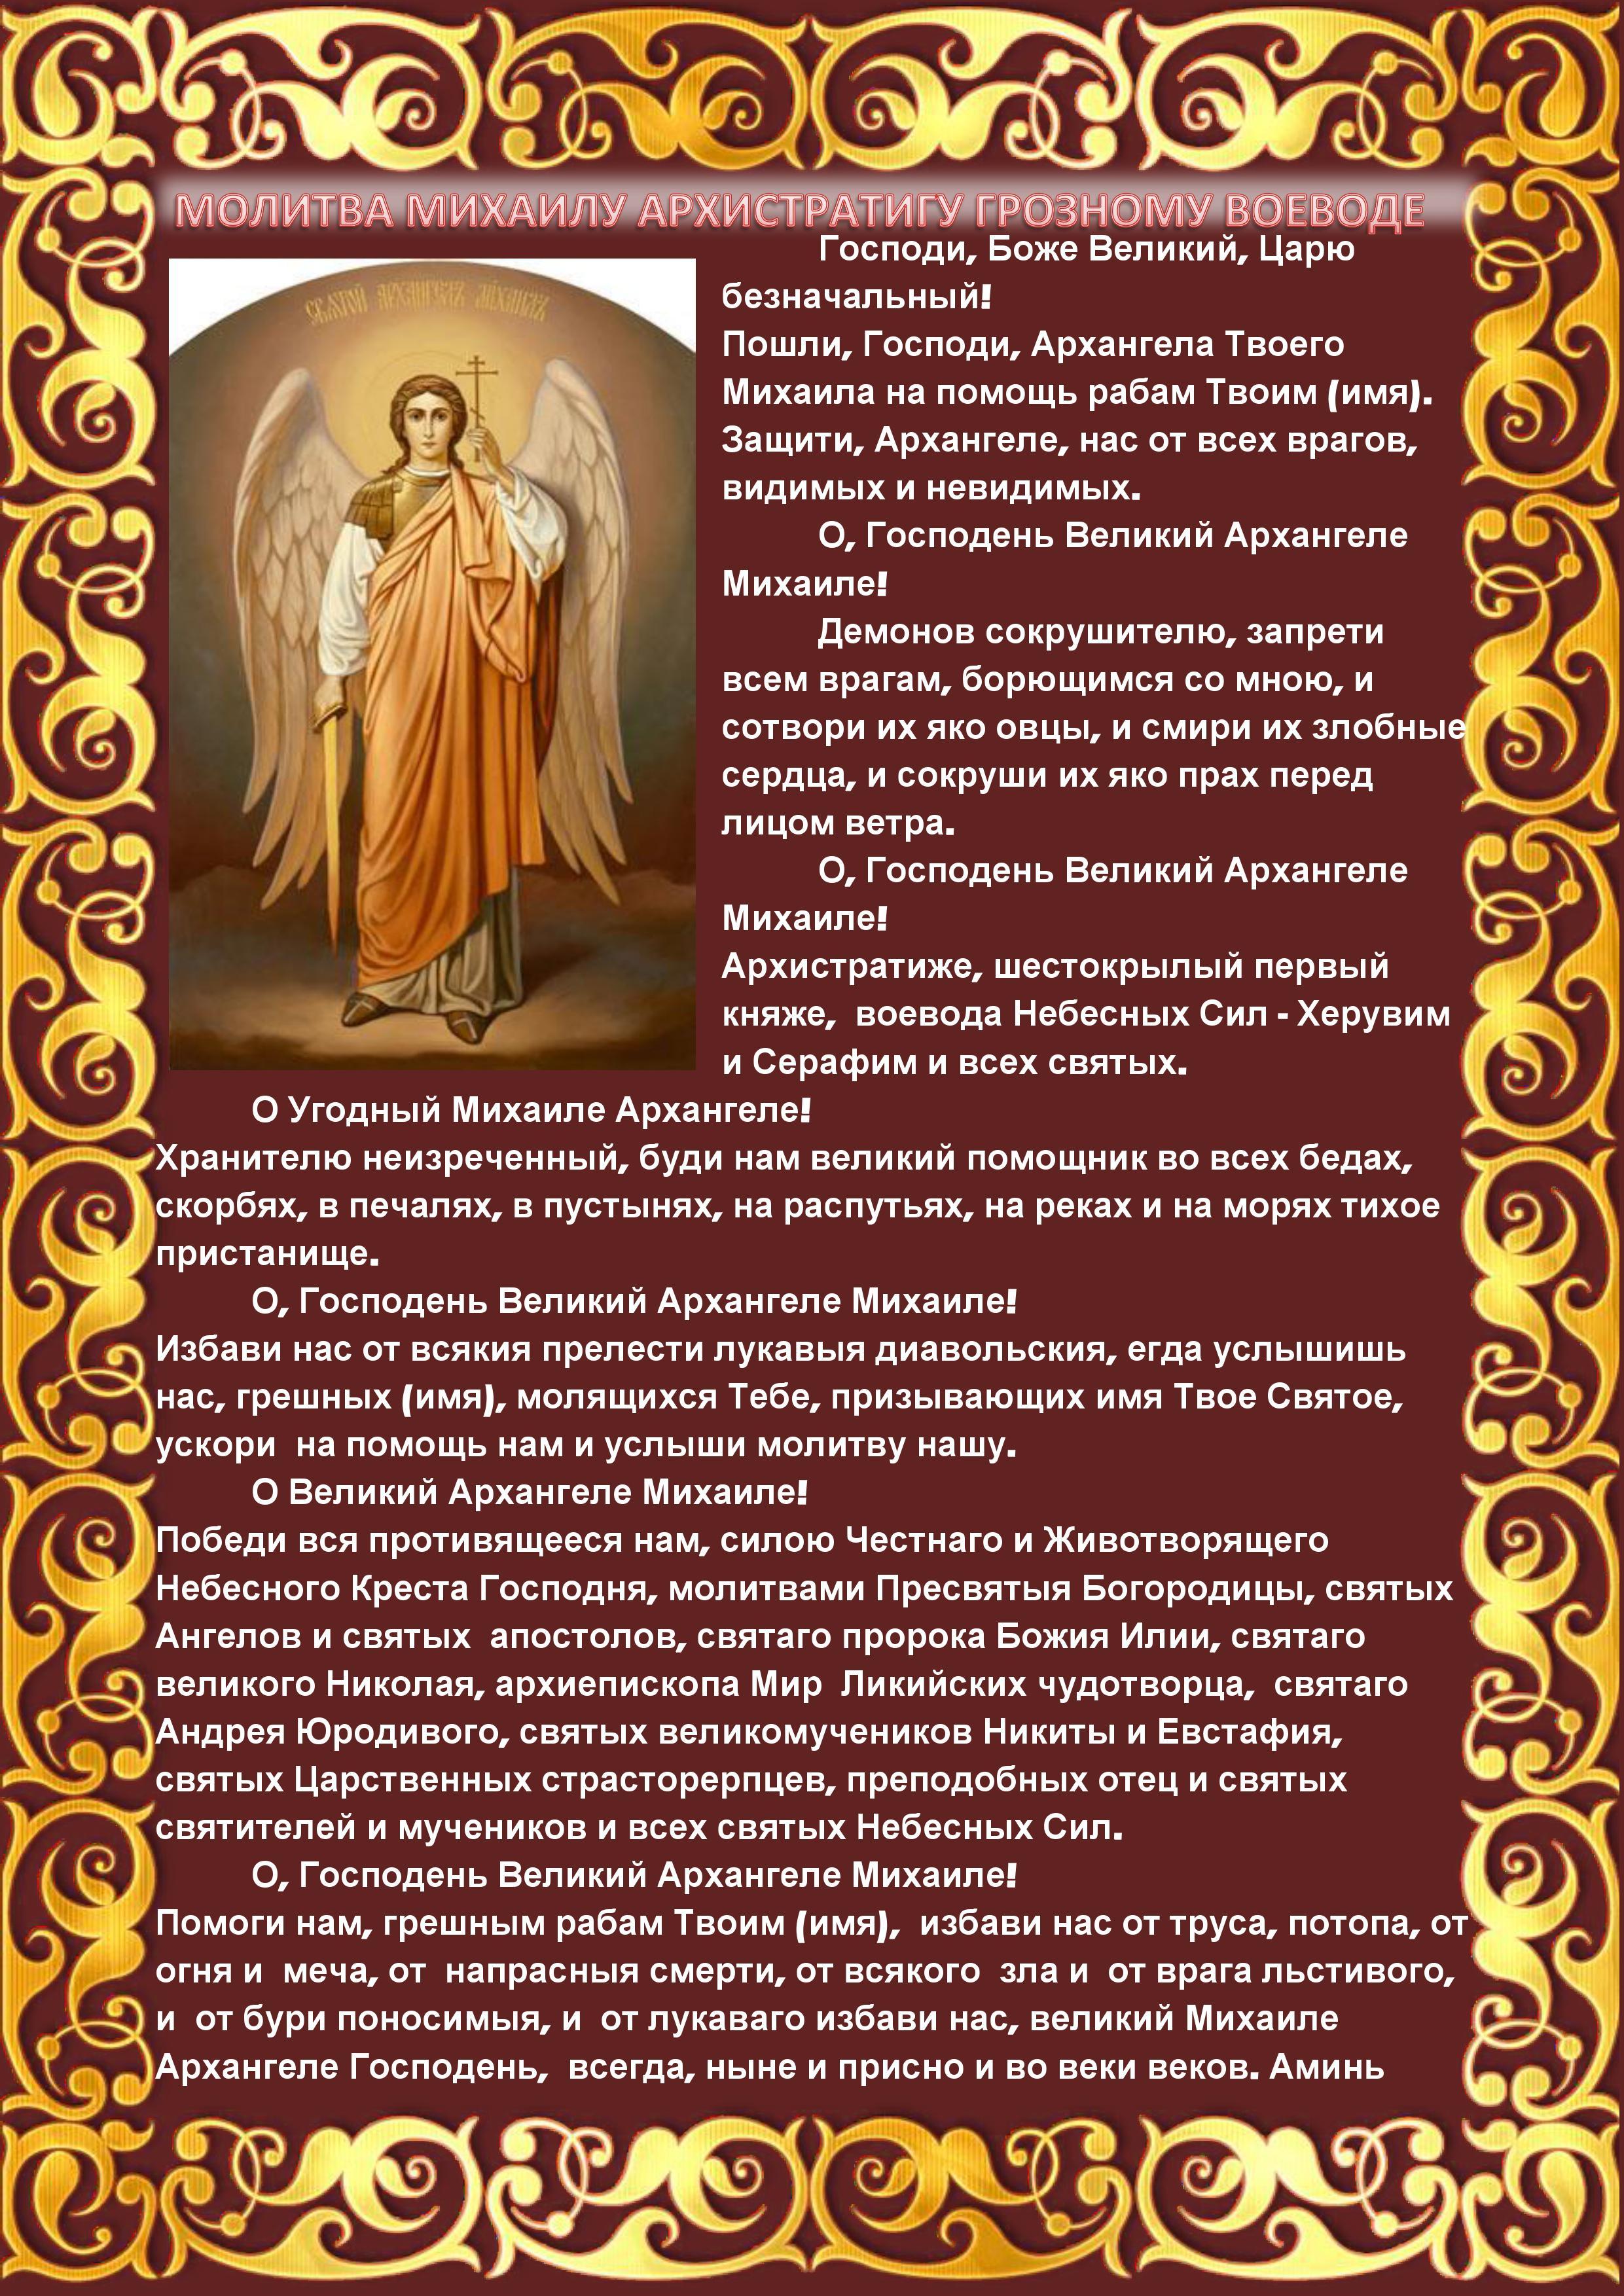 Молитва от порчи и сглаза к михаилу архангелу